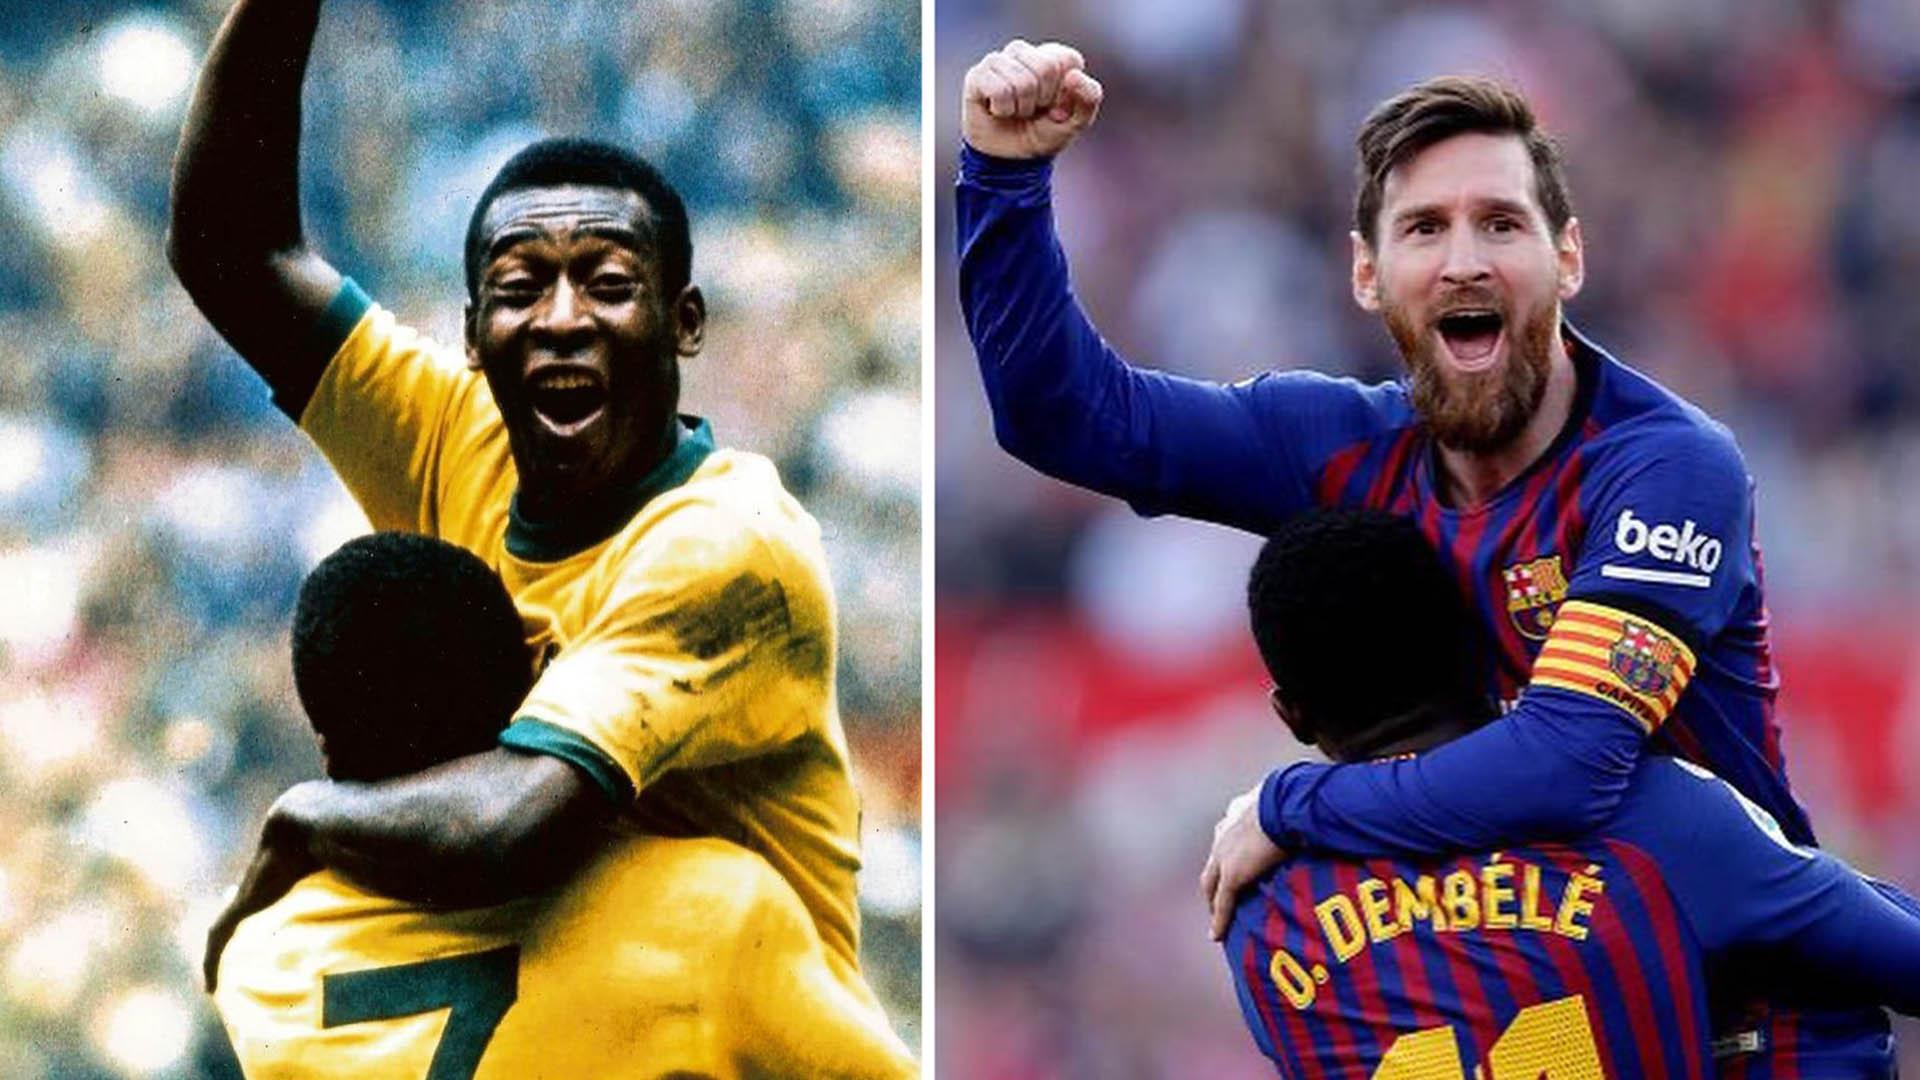 Messi iguala a Pelé en récord de goles con una misma camiseta